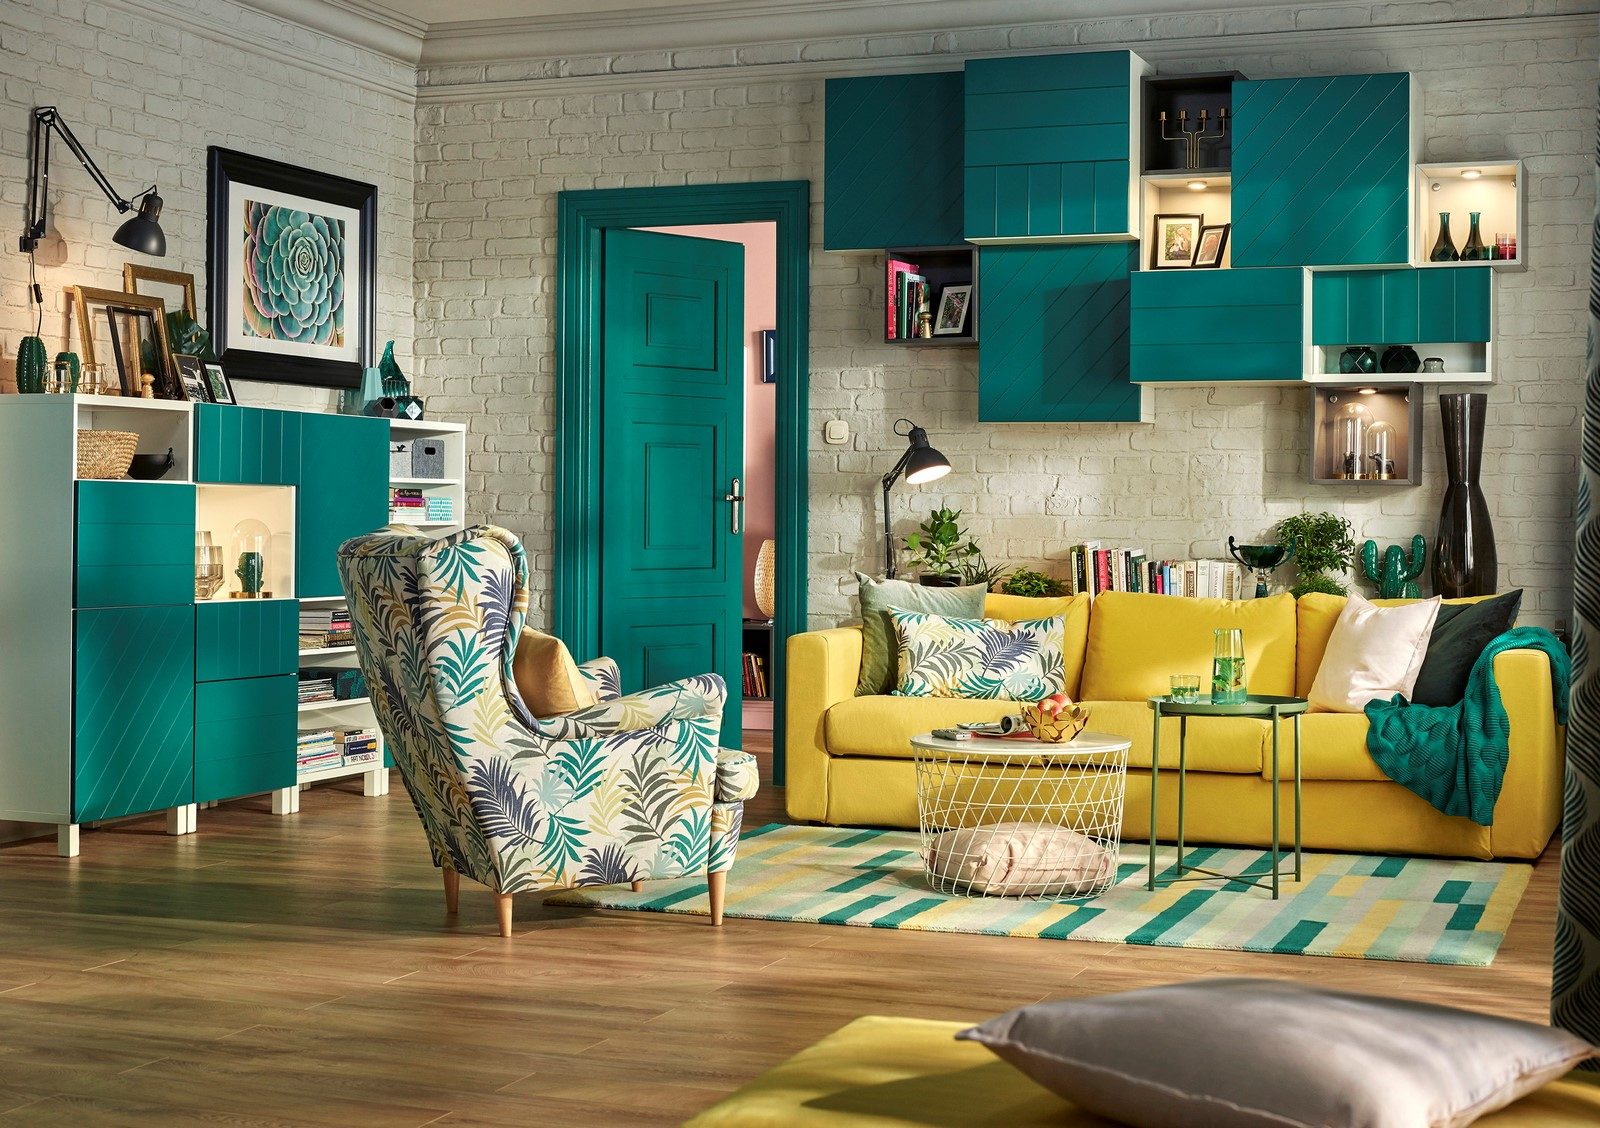 jackrecommends katalog ikea 2018 photo 20170731 filipzolynski 1 jack recommends. Black Bedroom Furniture Sets. Home Design Ideas